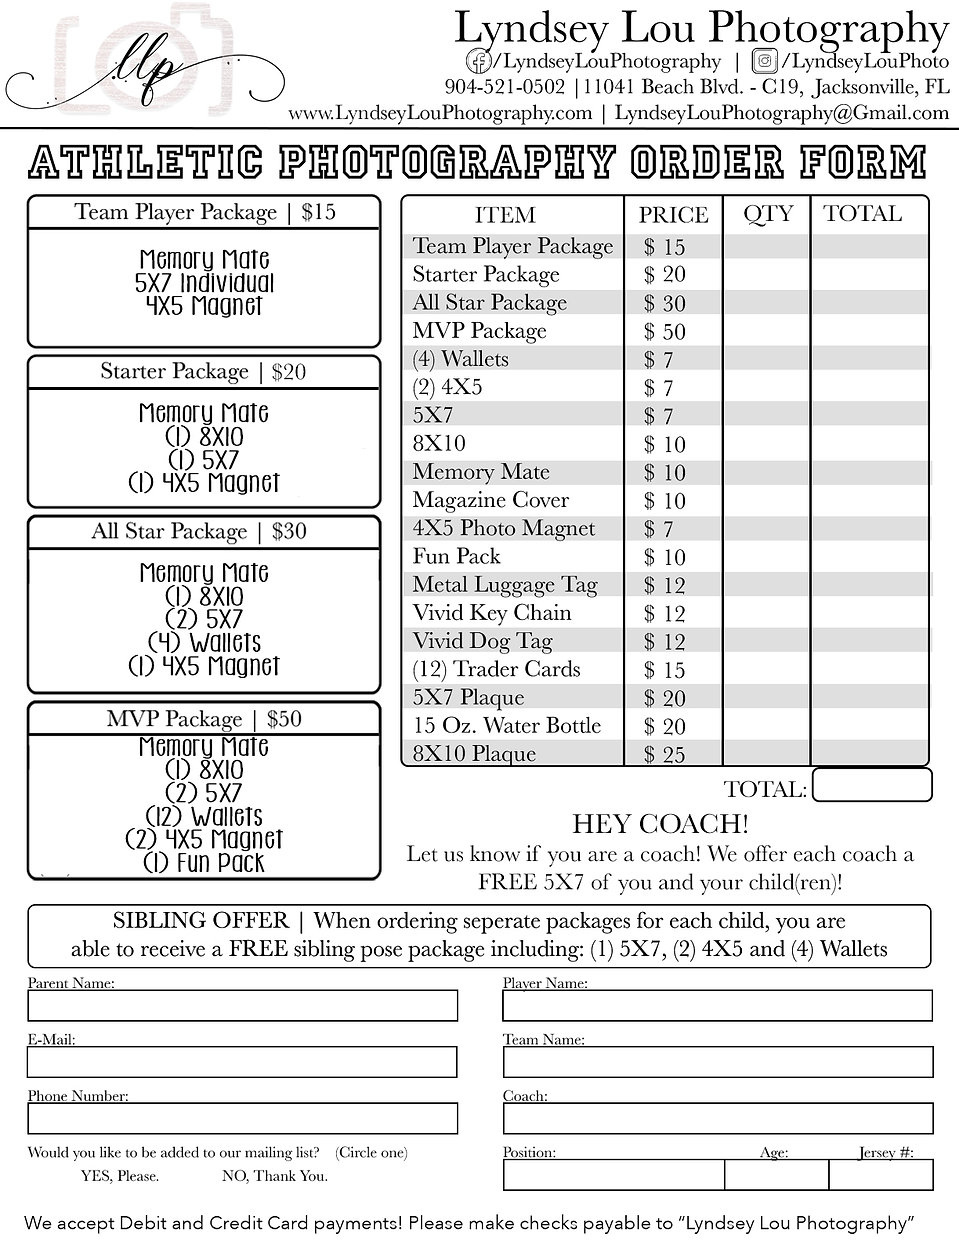 complete Sports order form.jpg